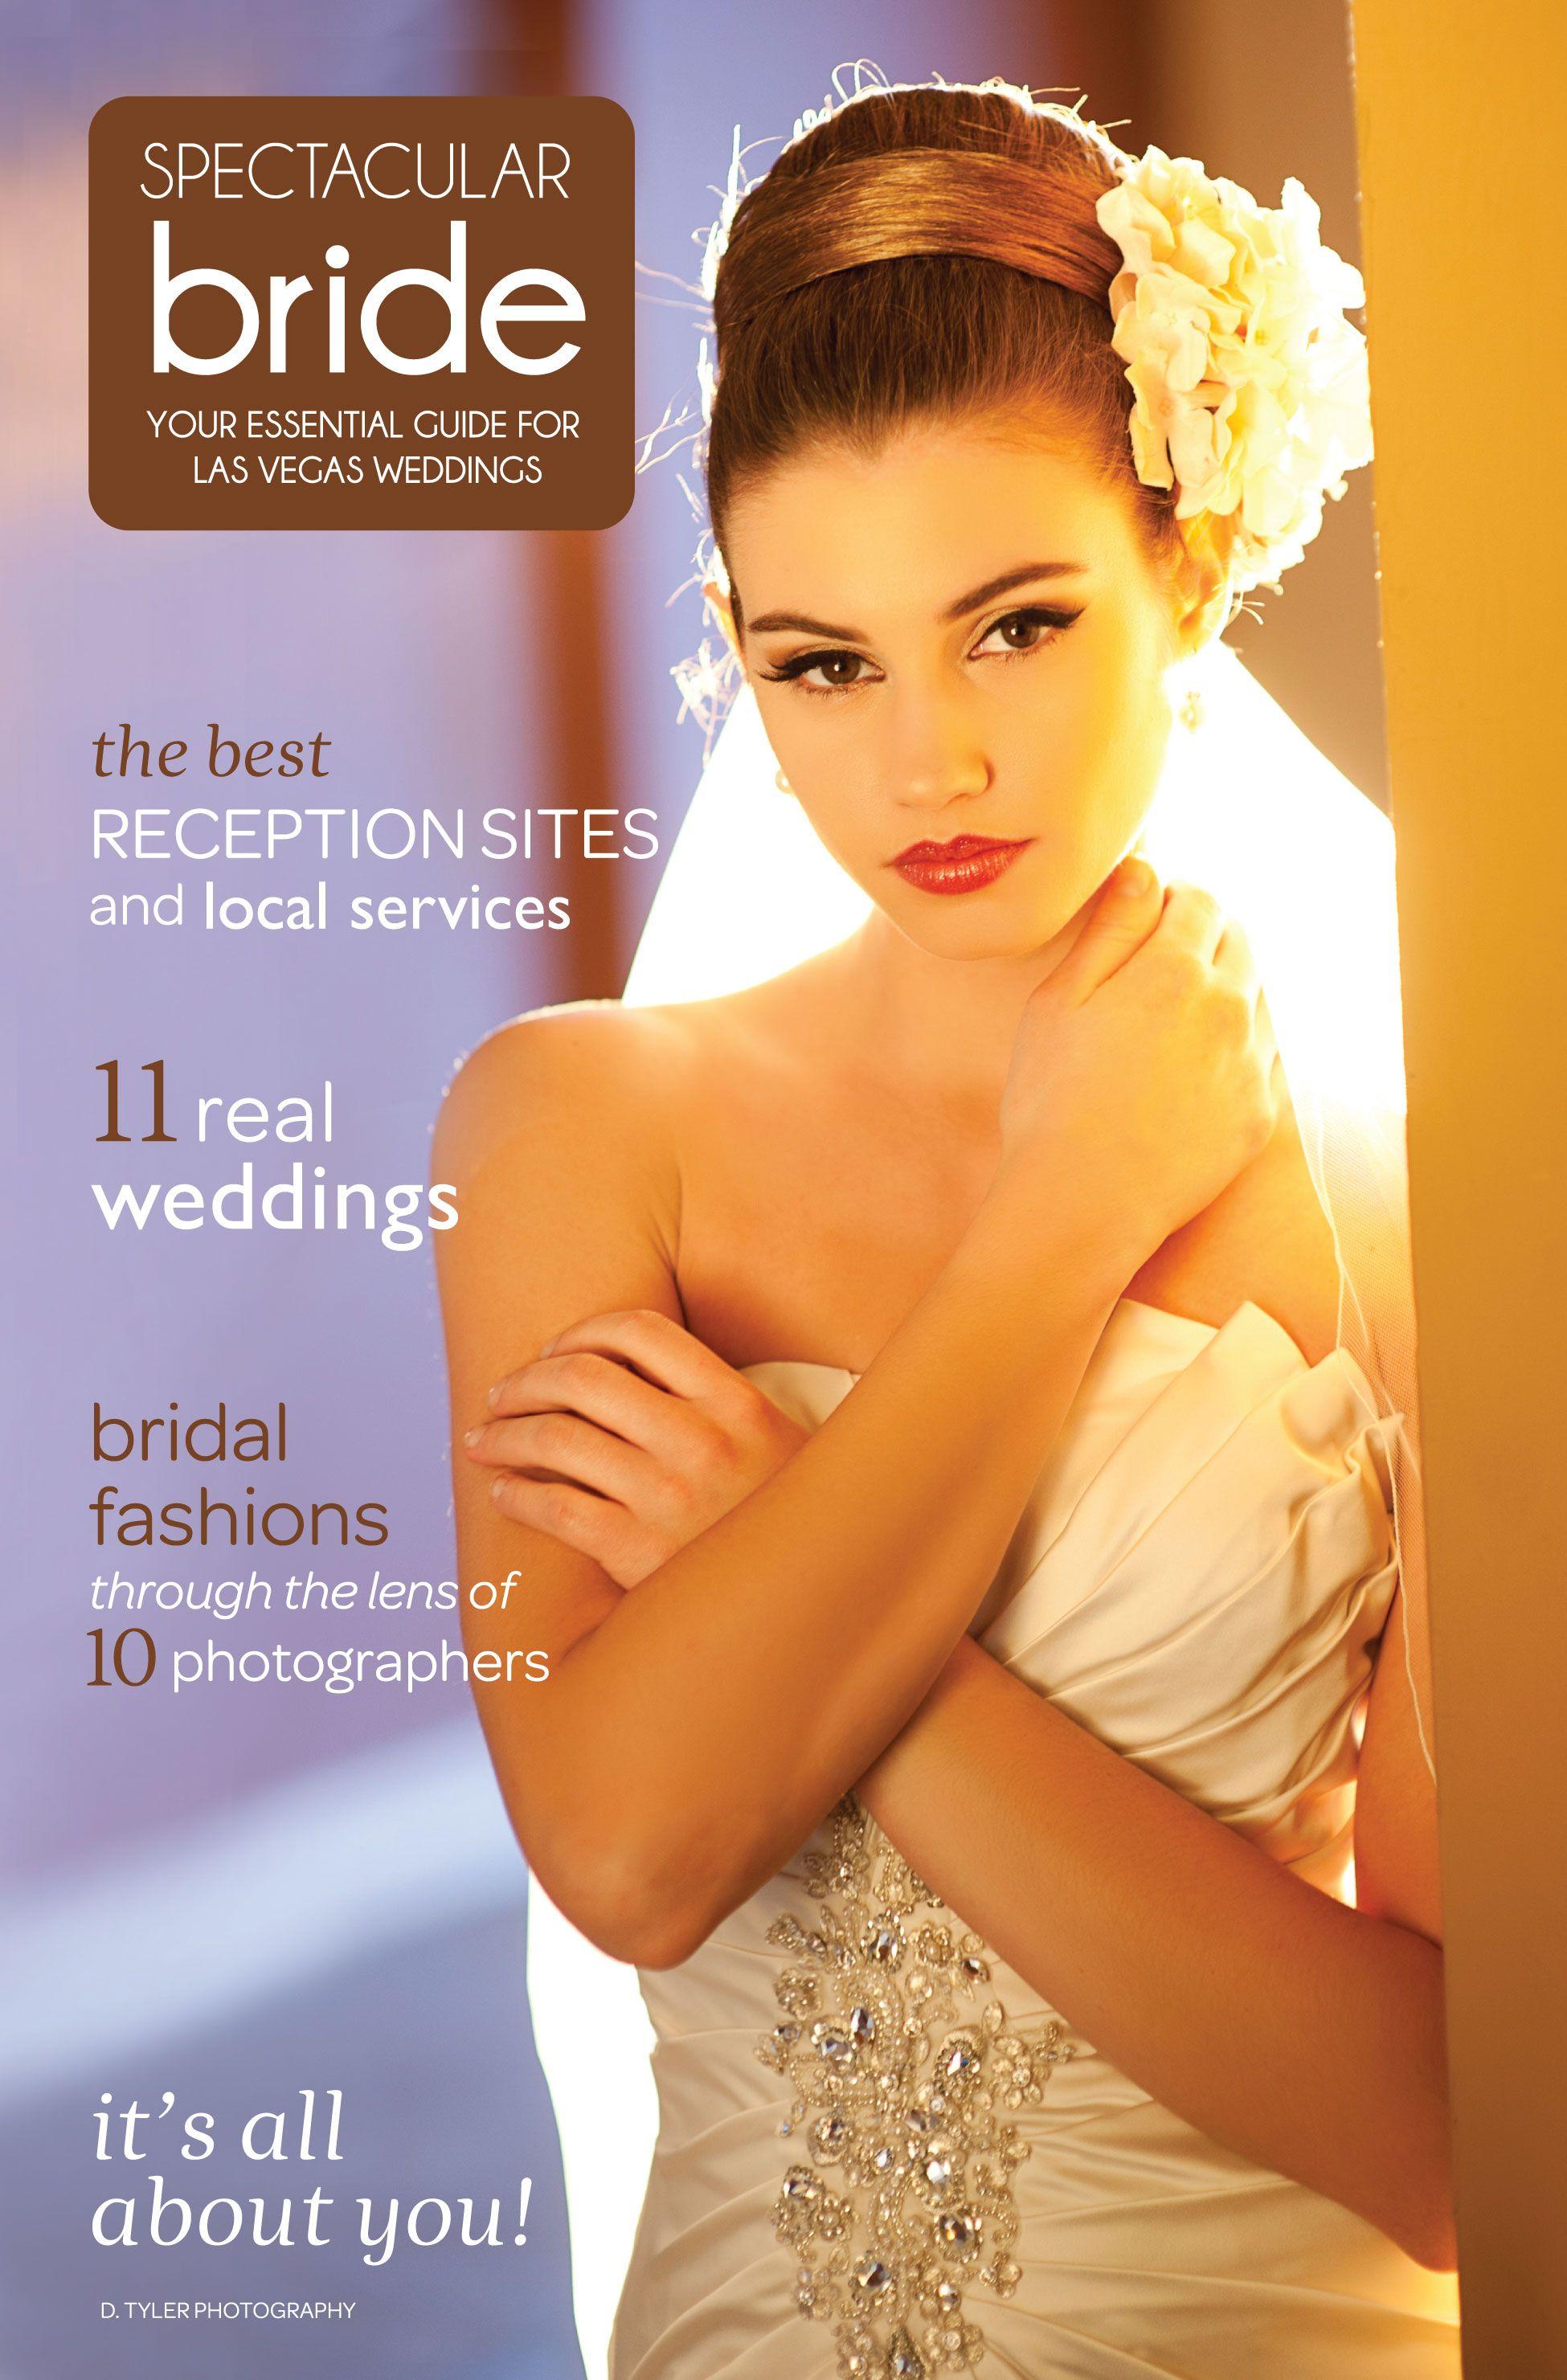 Las Vegas Wedding Hair and Makeup by Amelia C & Co